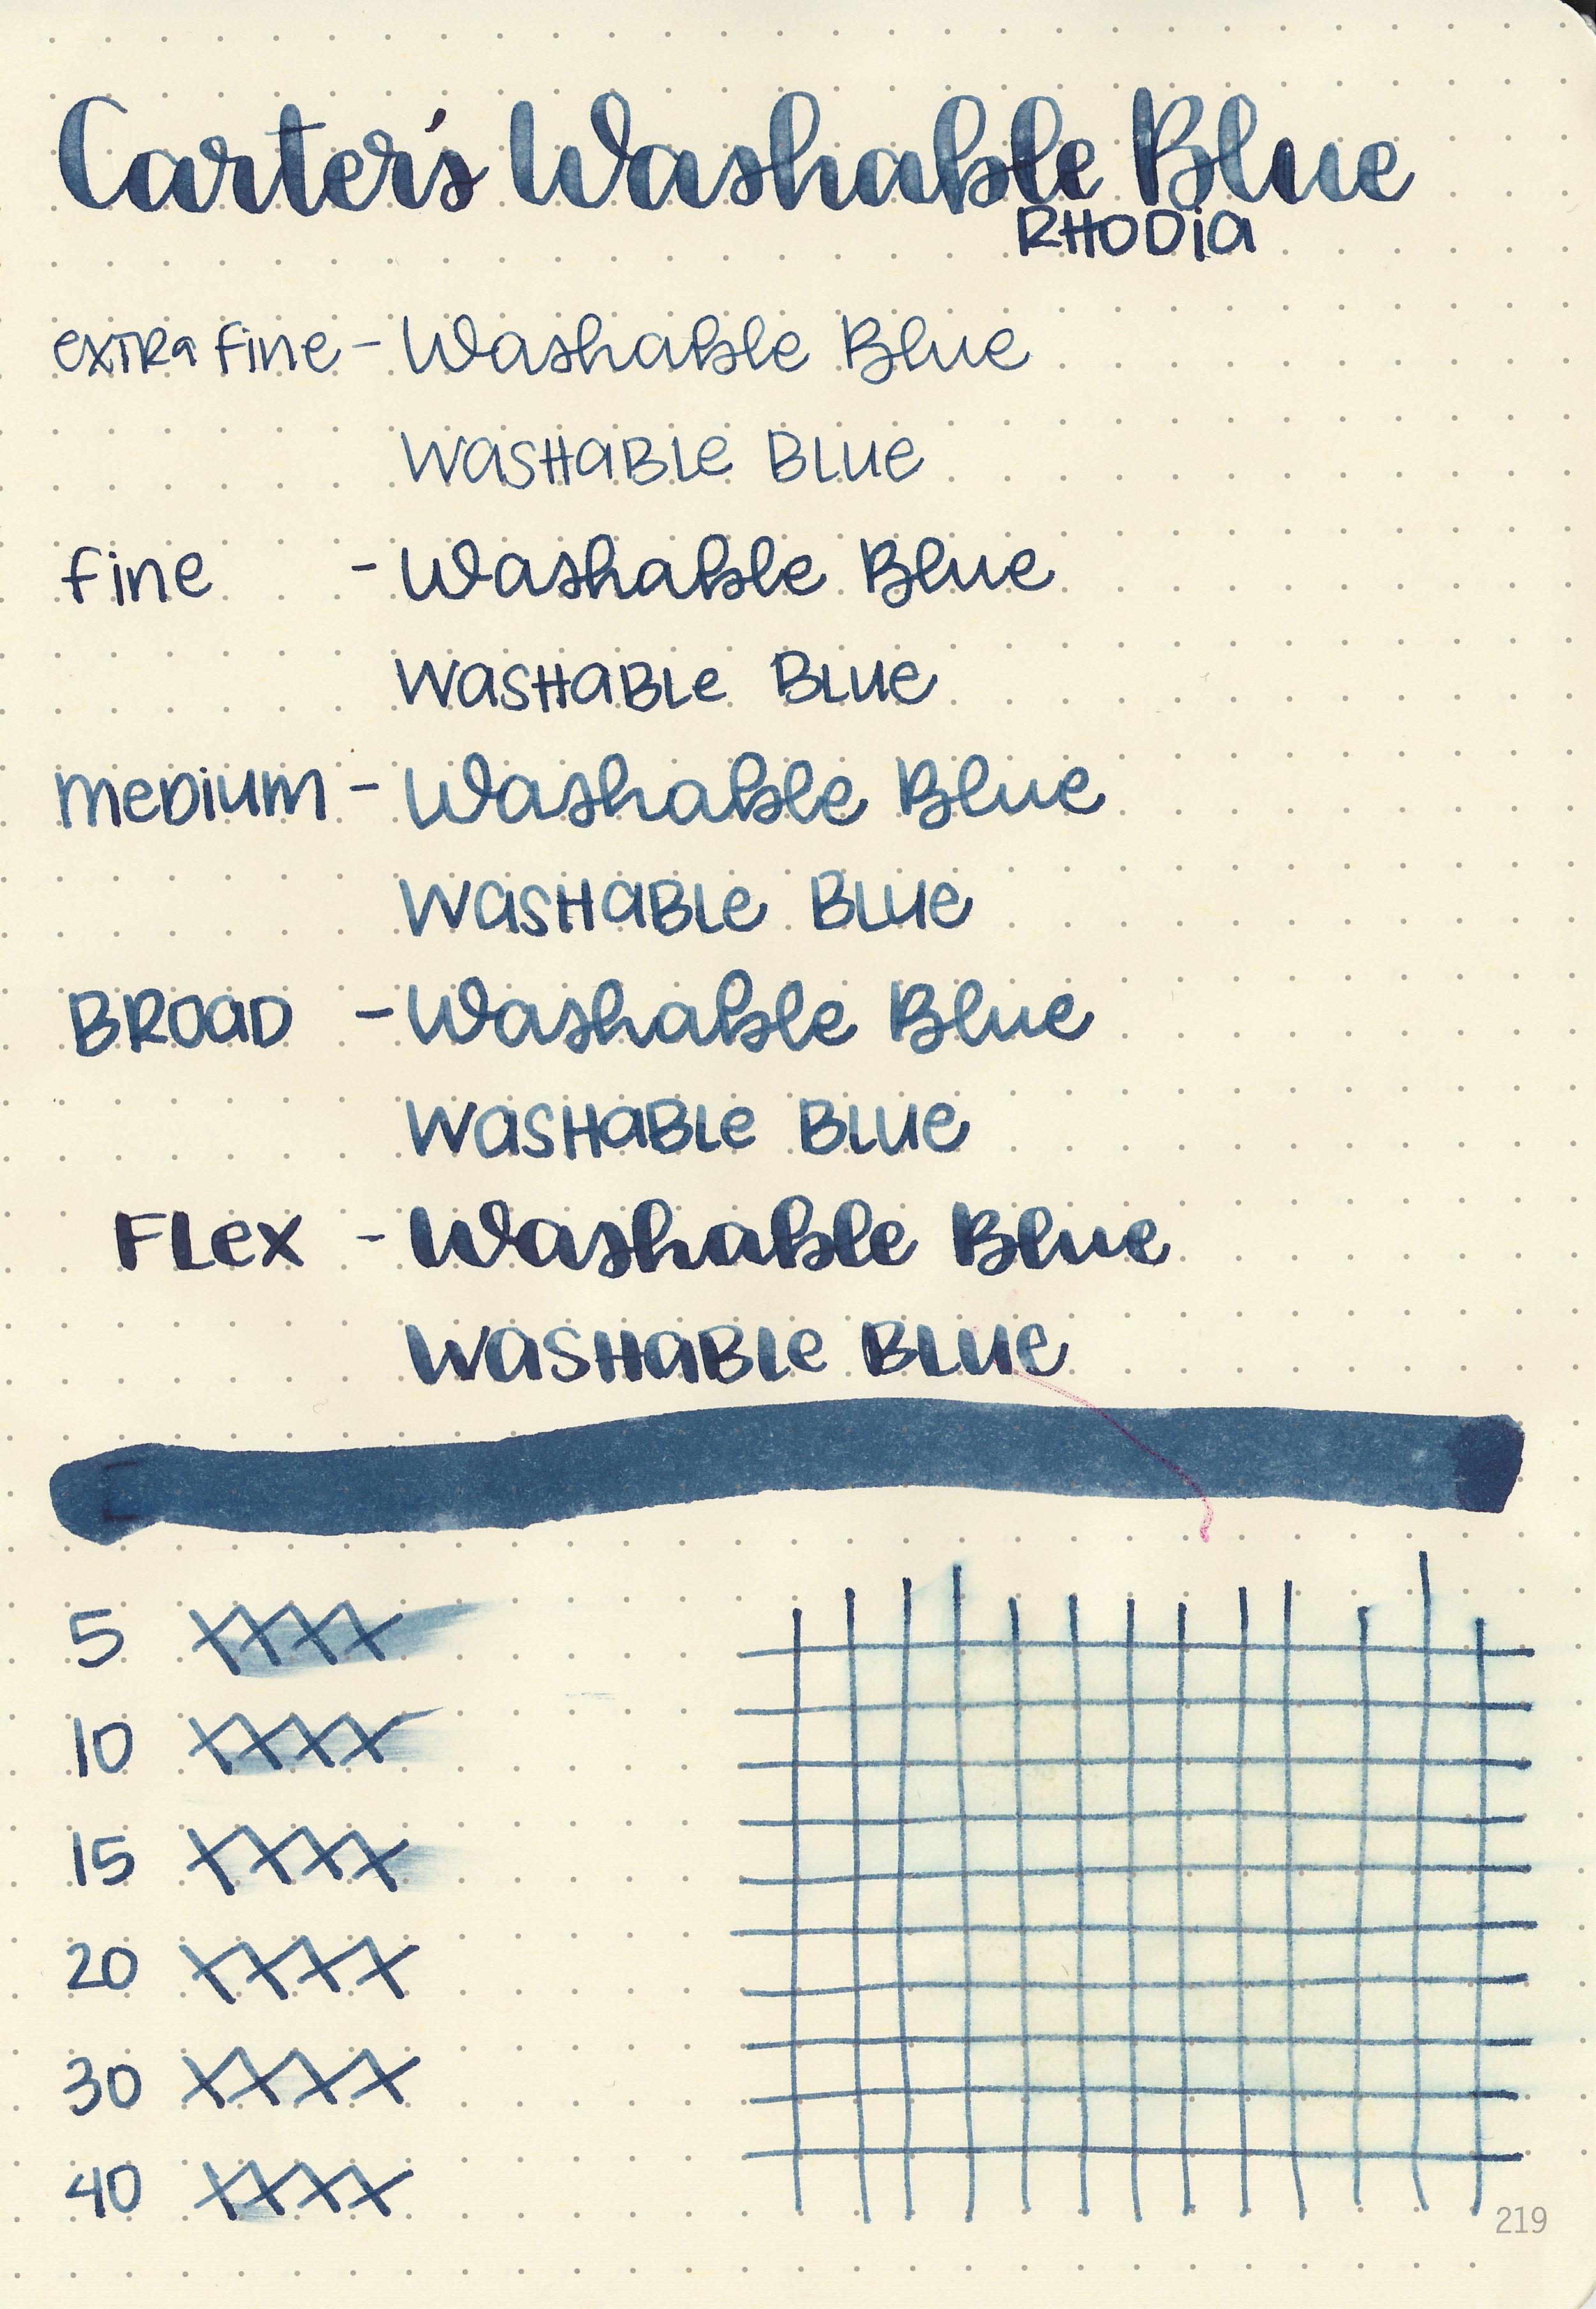 cart-washable-blue-4.jpg